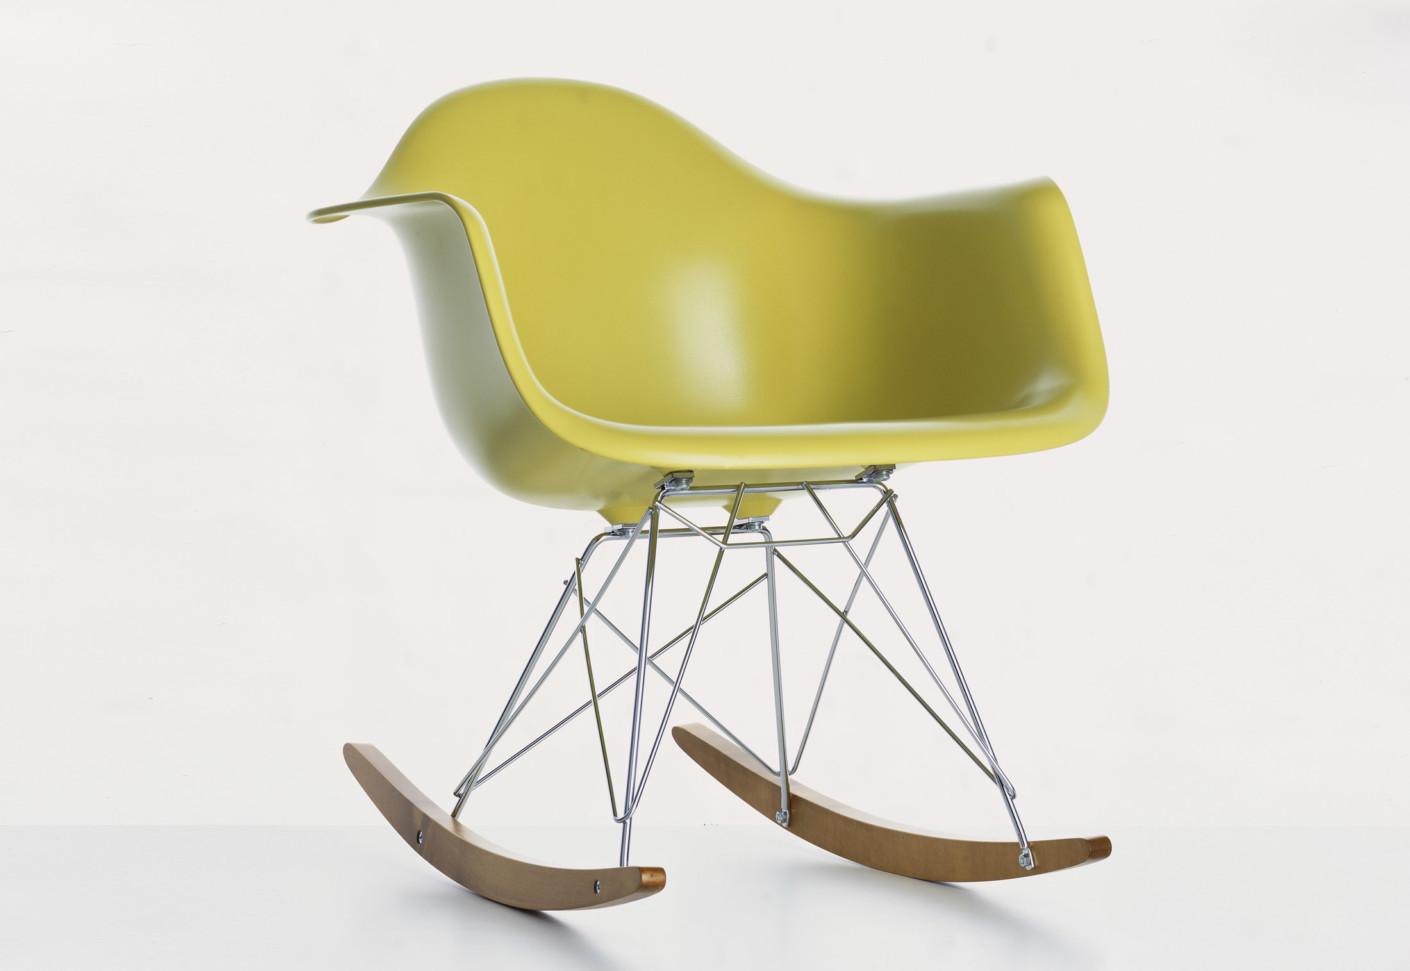 Vitra Sedia A Dondolo Eames Plastic Armchair Rar : Squarcina vitra eames plastic chair rar squarcina